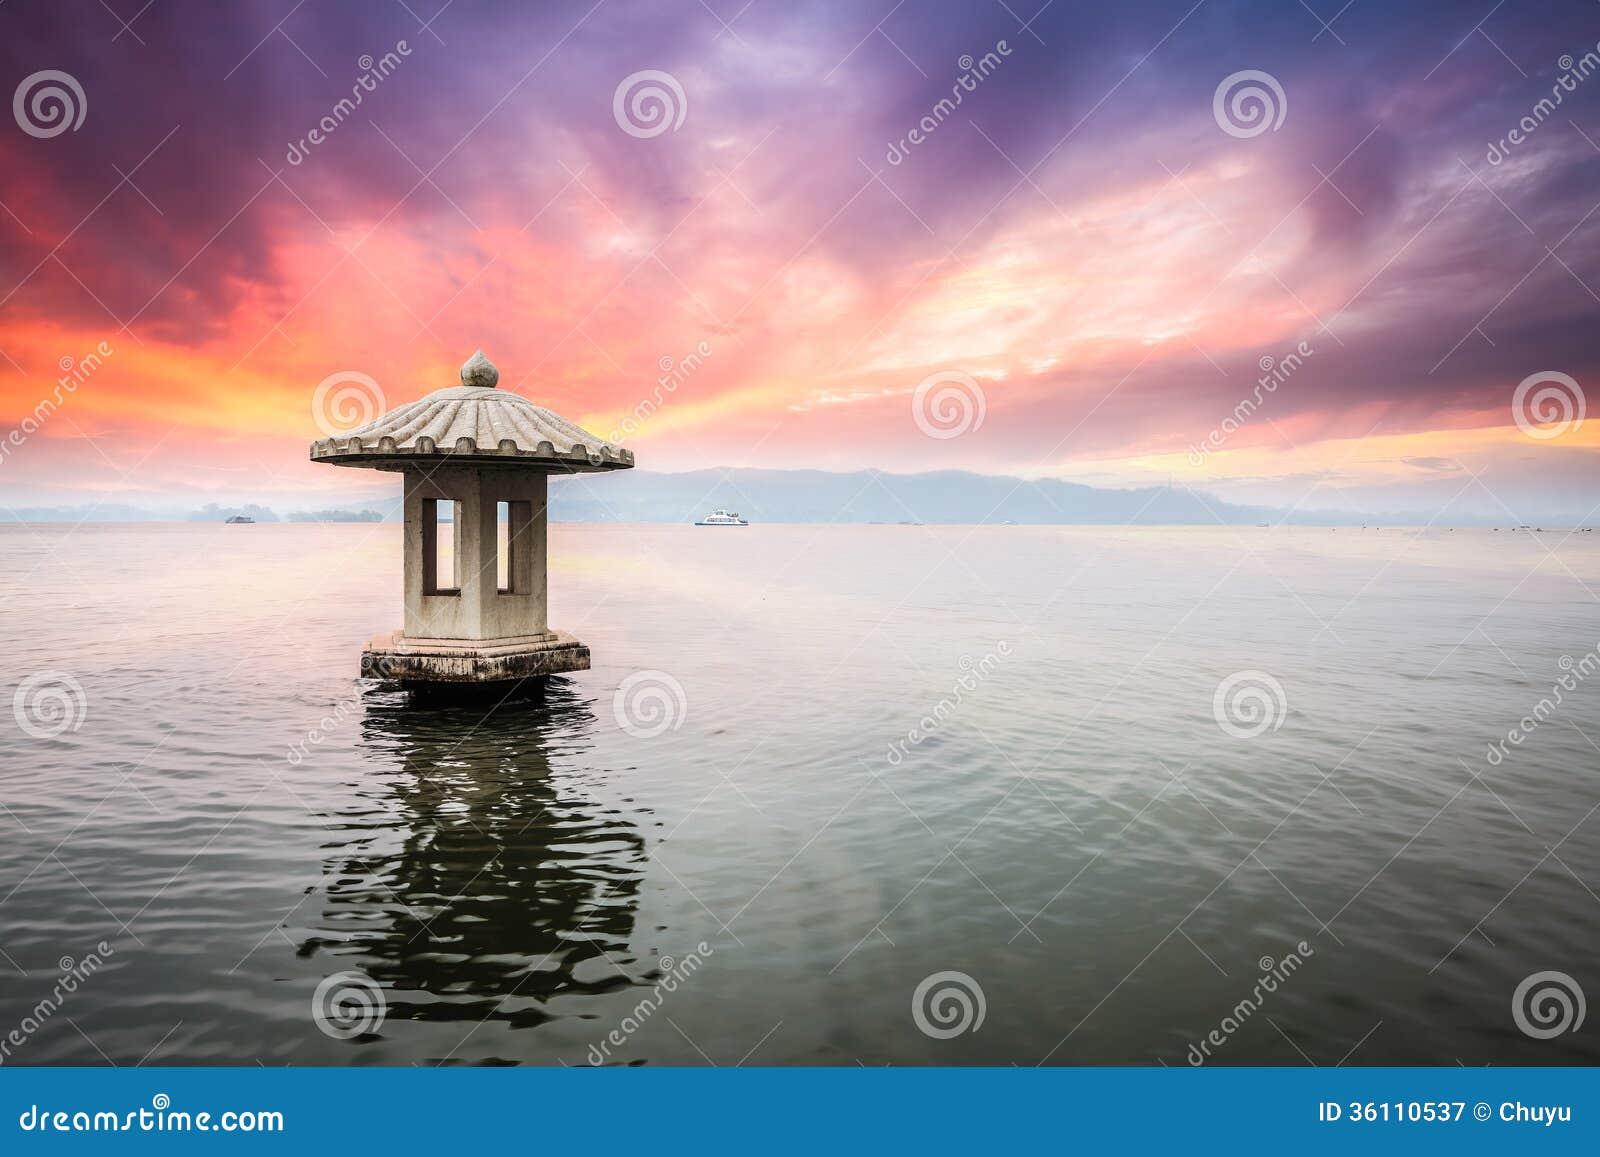 Hangzhou Scenery In Sunset Stock Image  Image Of Landscape